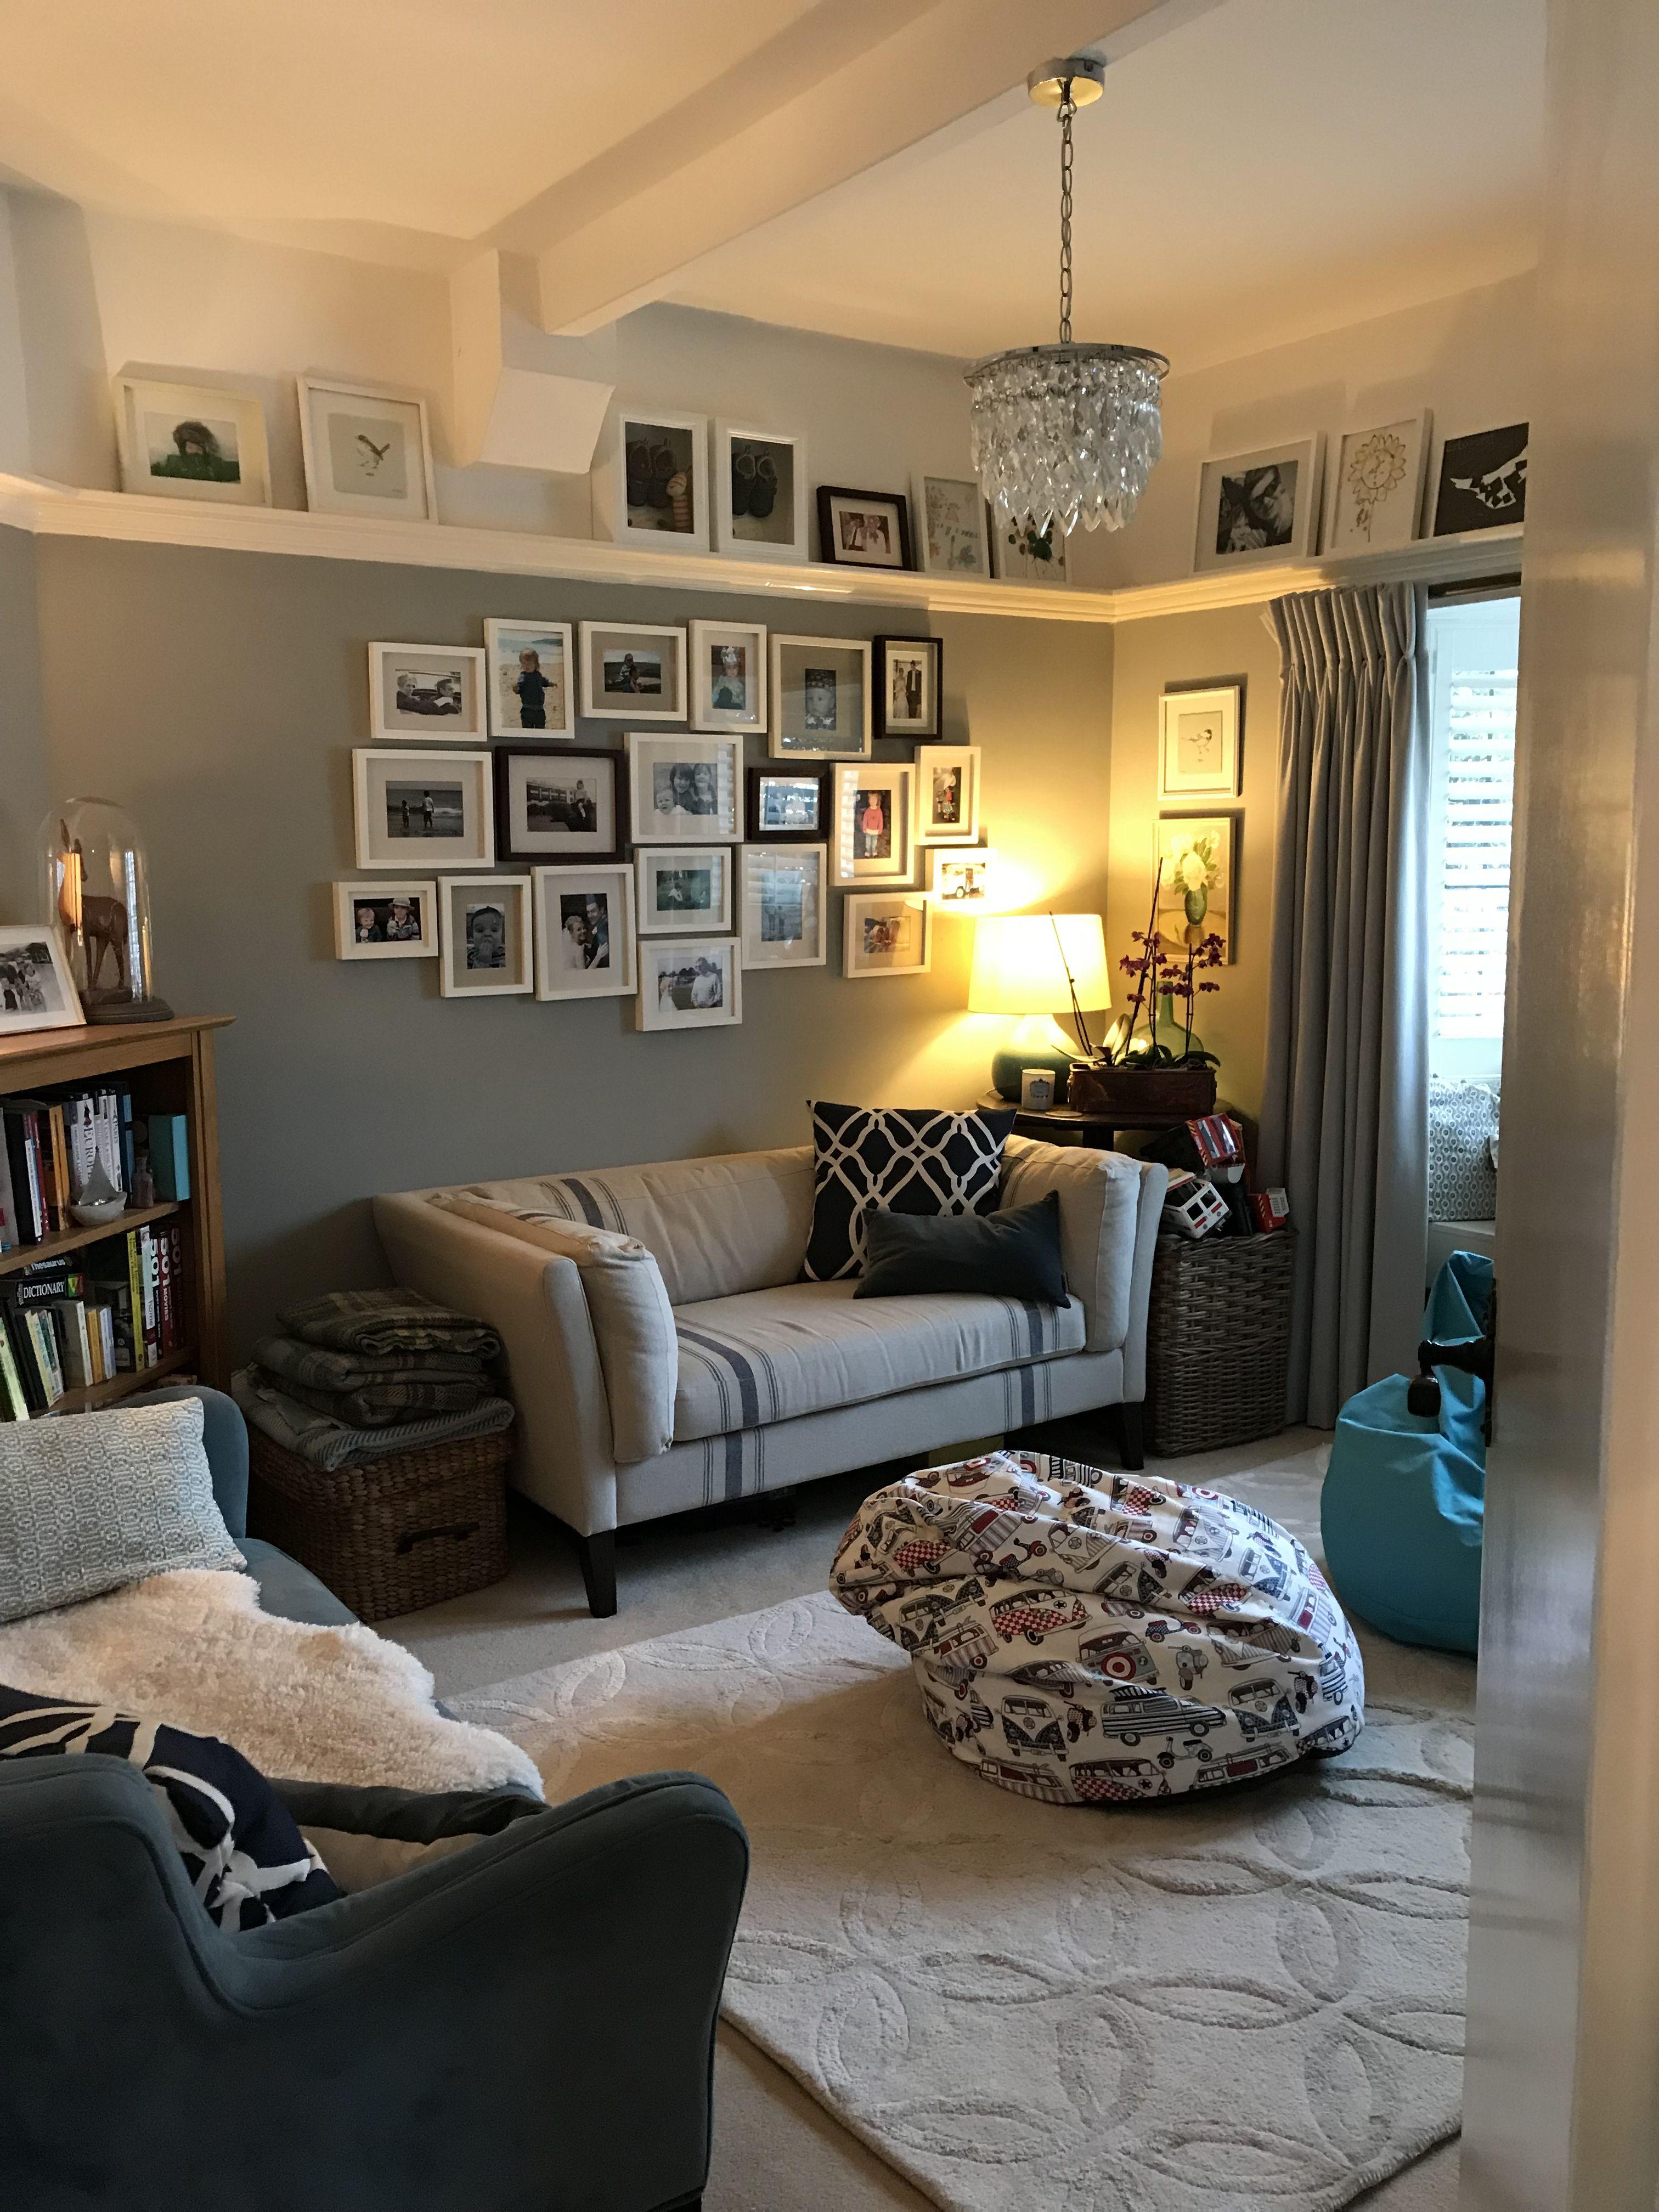 Cosy Playroom & Den Home decor, Decor, Room